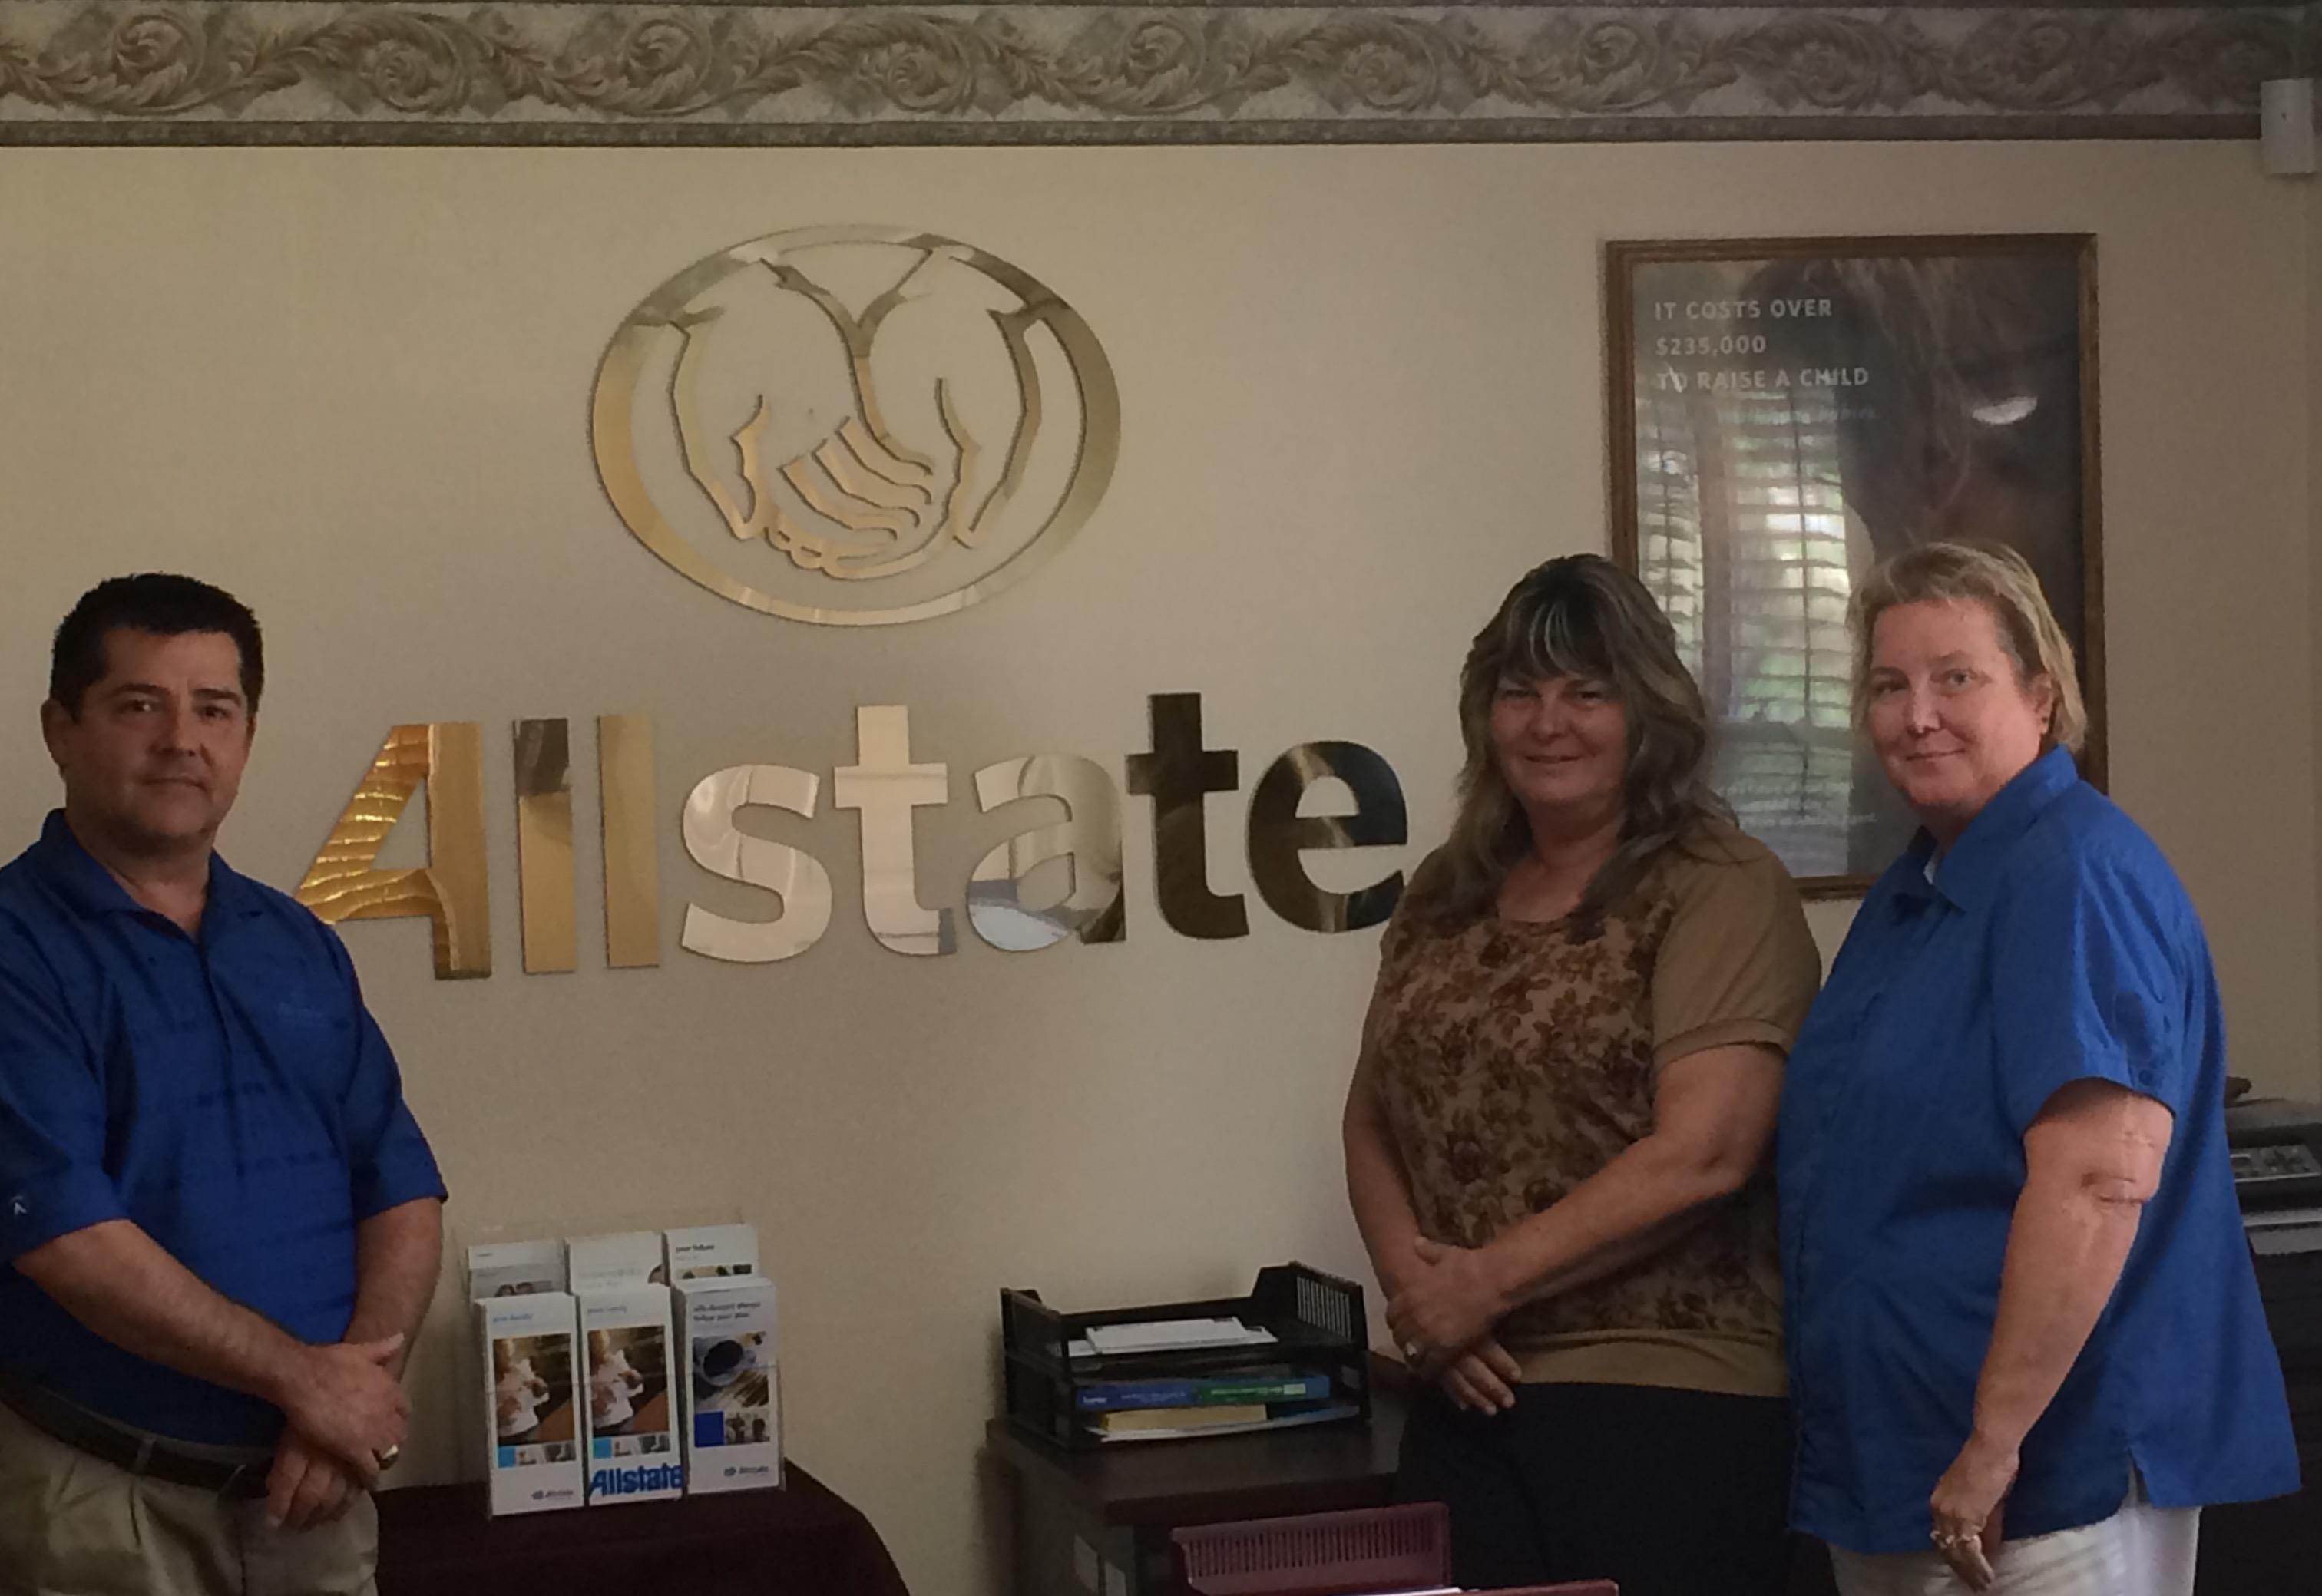 Kevin Gwozdz: Allstate Insurance image 2